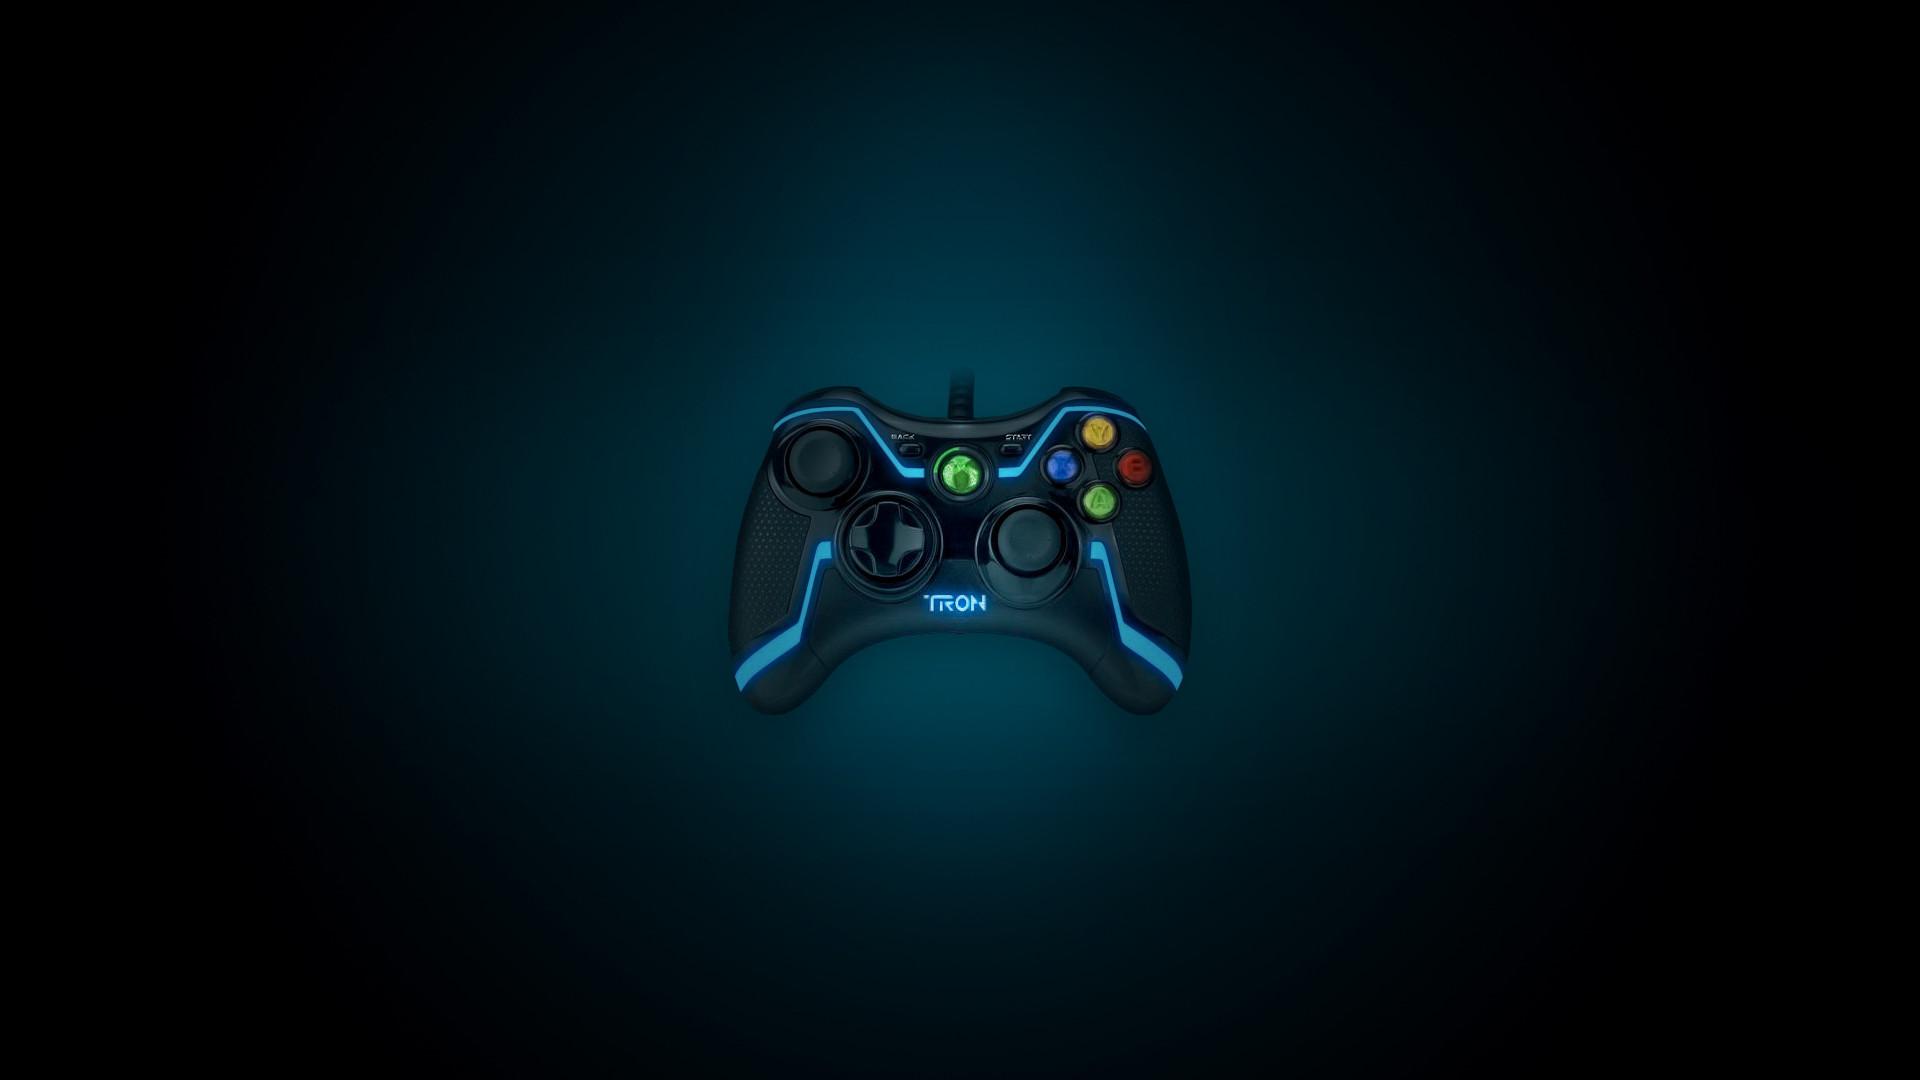 Xbox Wallpaper Reddit